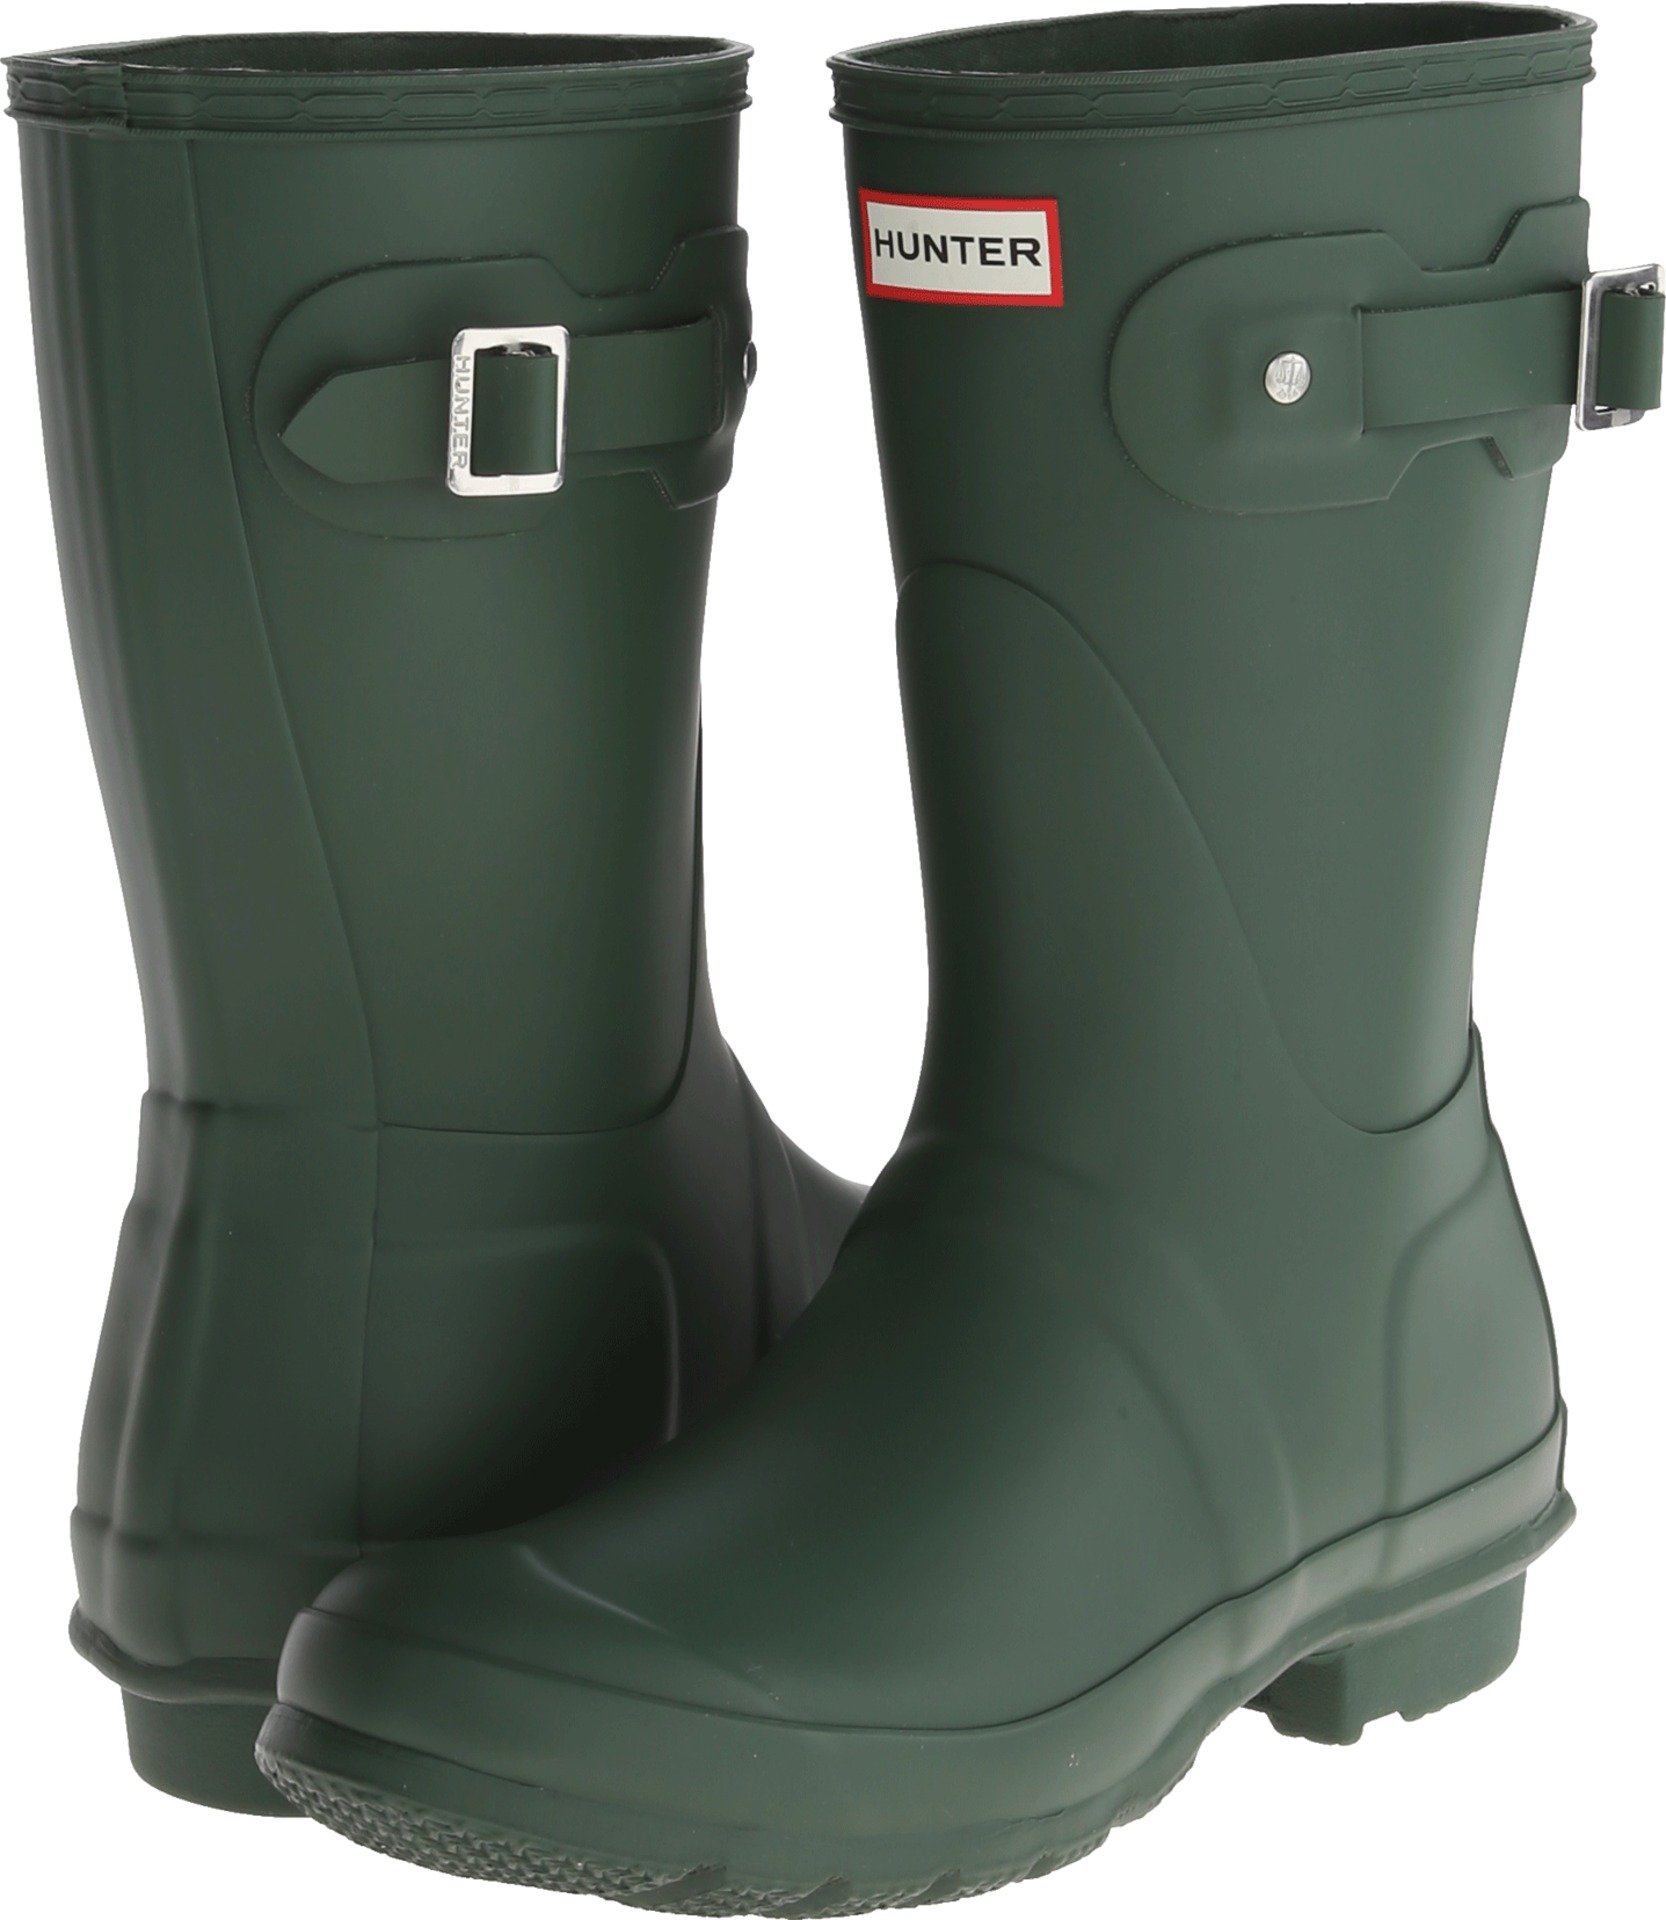 Hunter Womens Original Short Hunter Green Rain Boot - 8 B(M) US